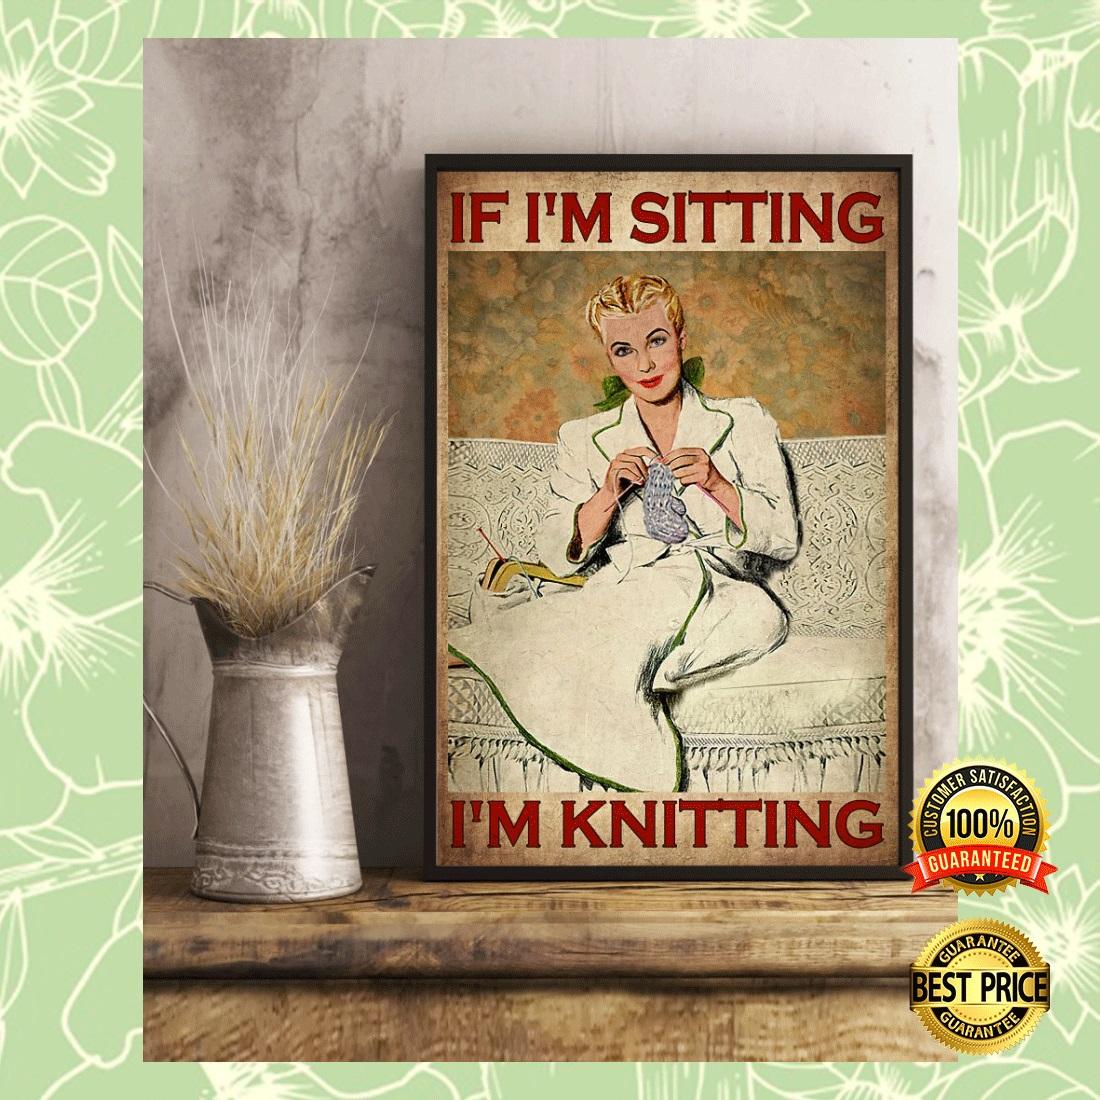 IF I'M SITTING I'M KNITTING POSTER 4